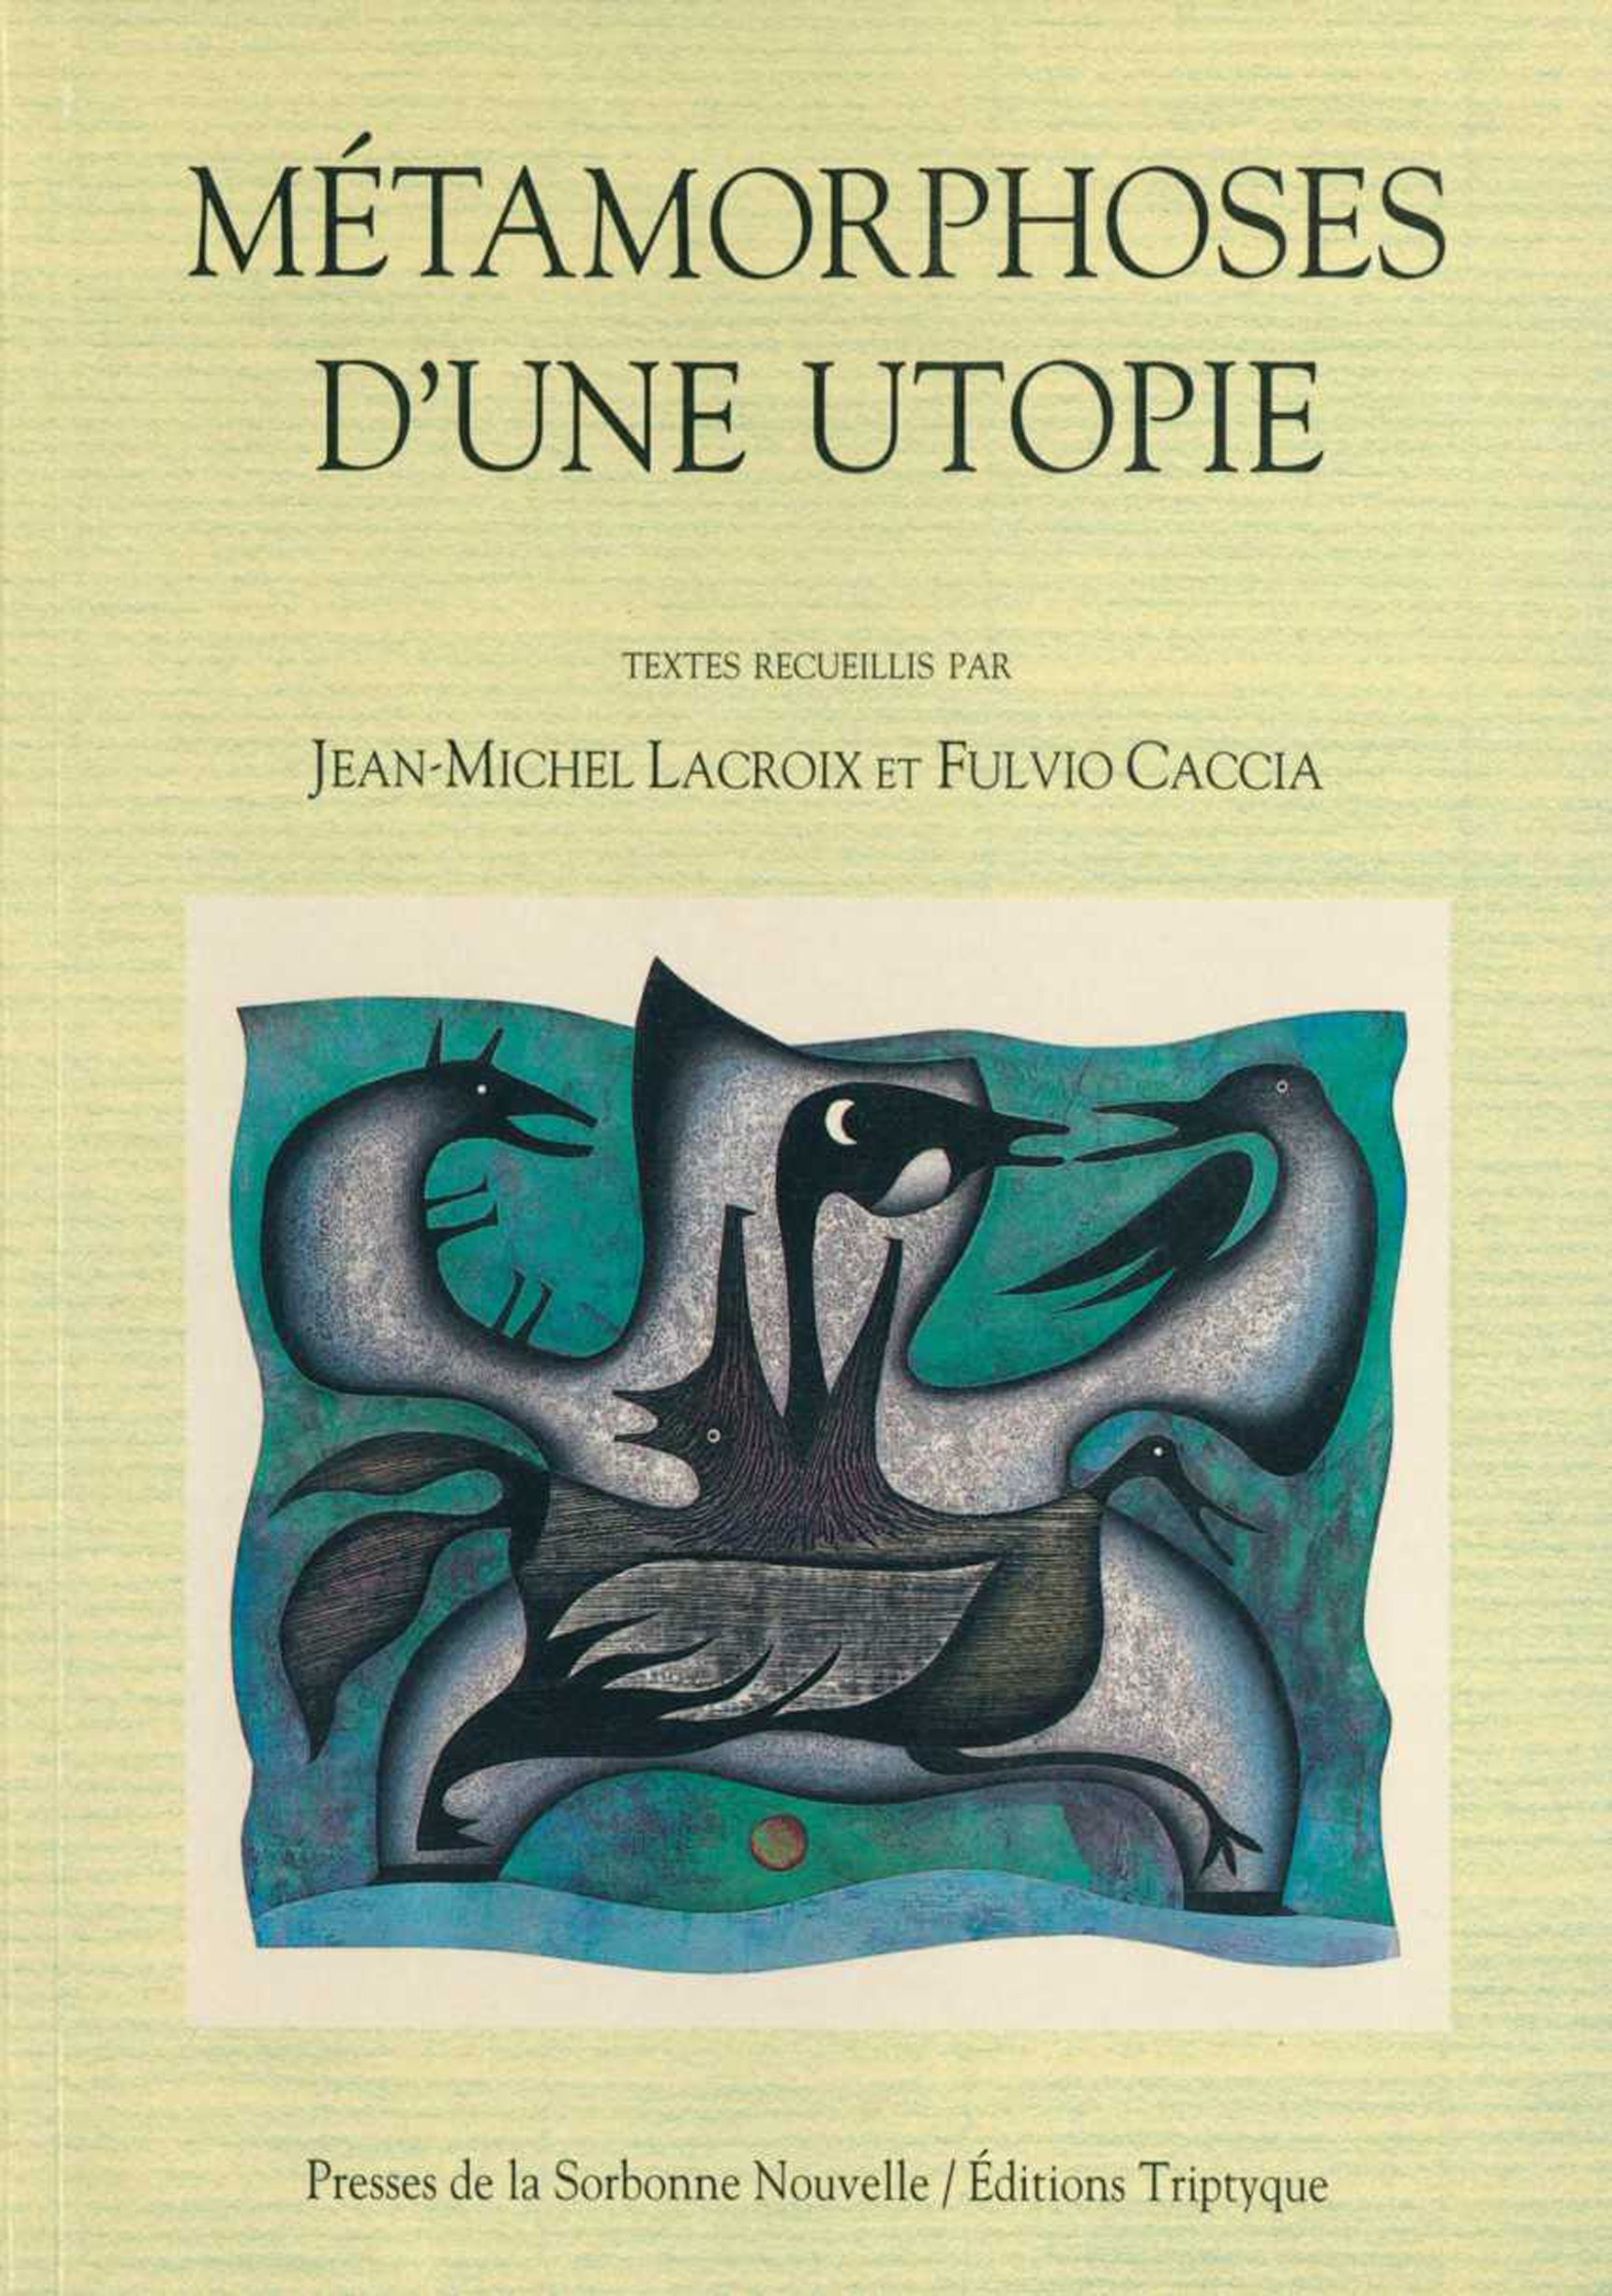 Metamorphoses d'une utopie - [premier colloque international, paris, 22 au 25 mai 1991]